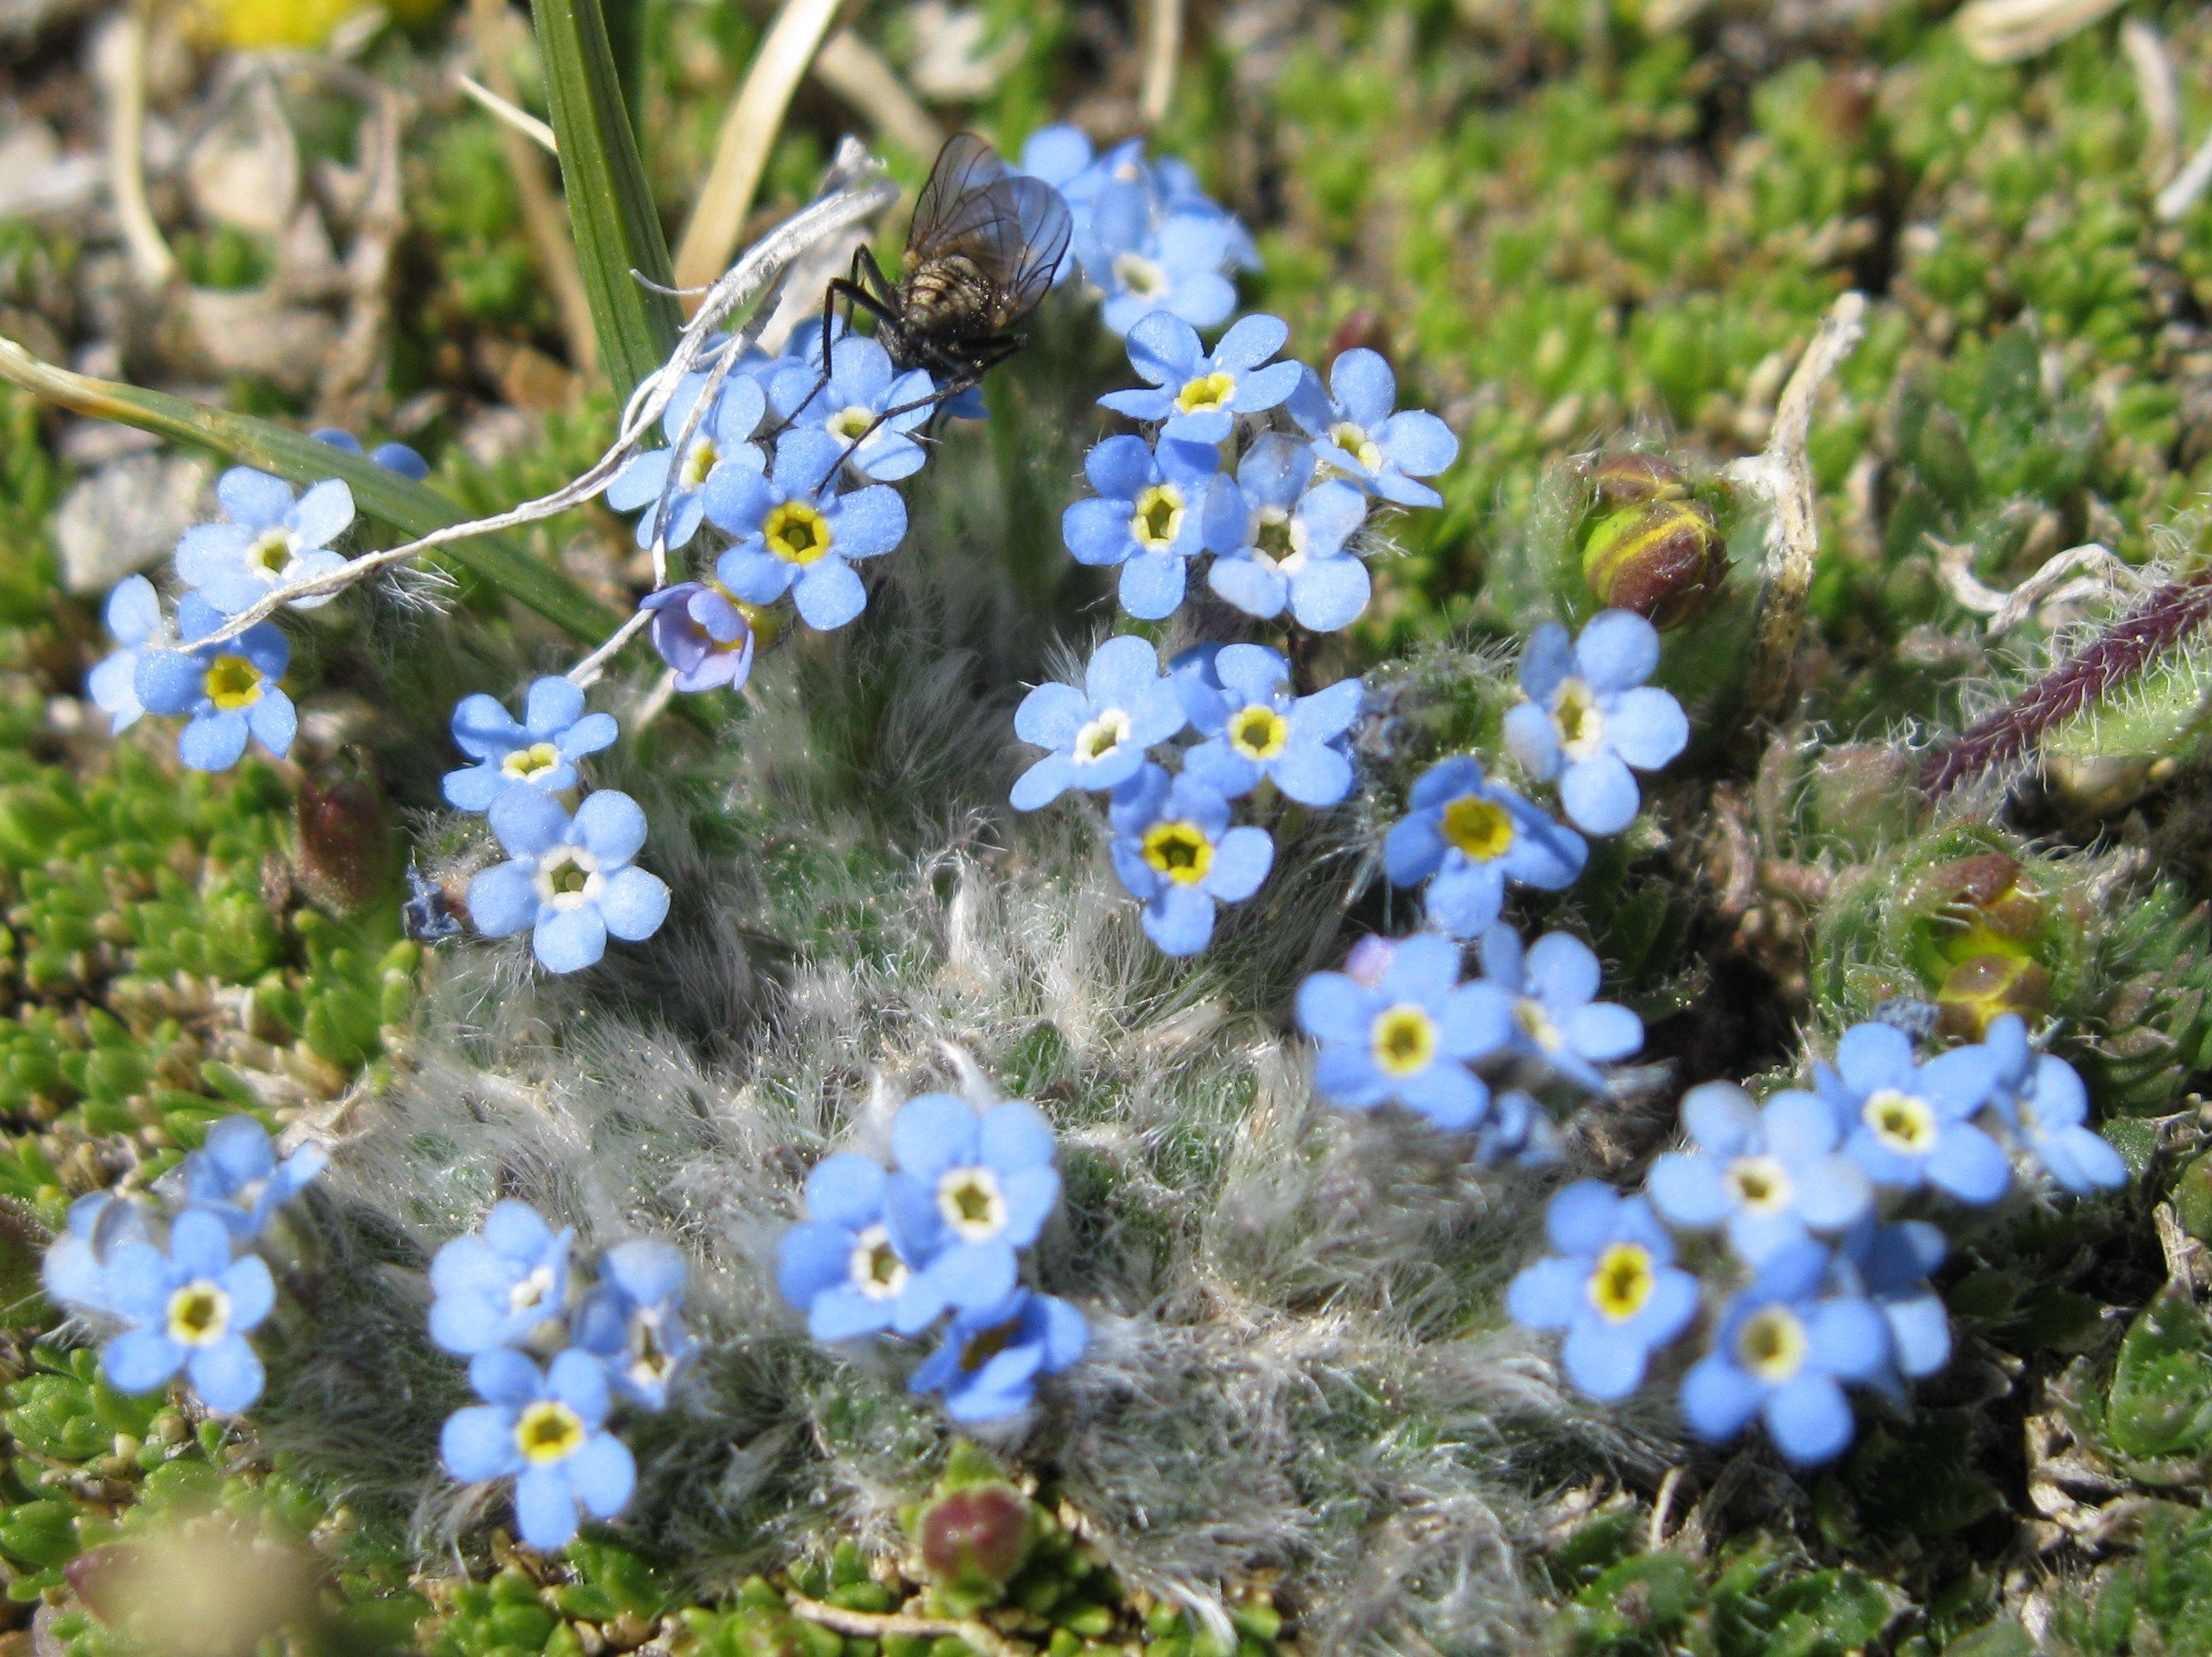 tundra biome plants Google Search Biomes, Wild flowers